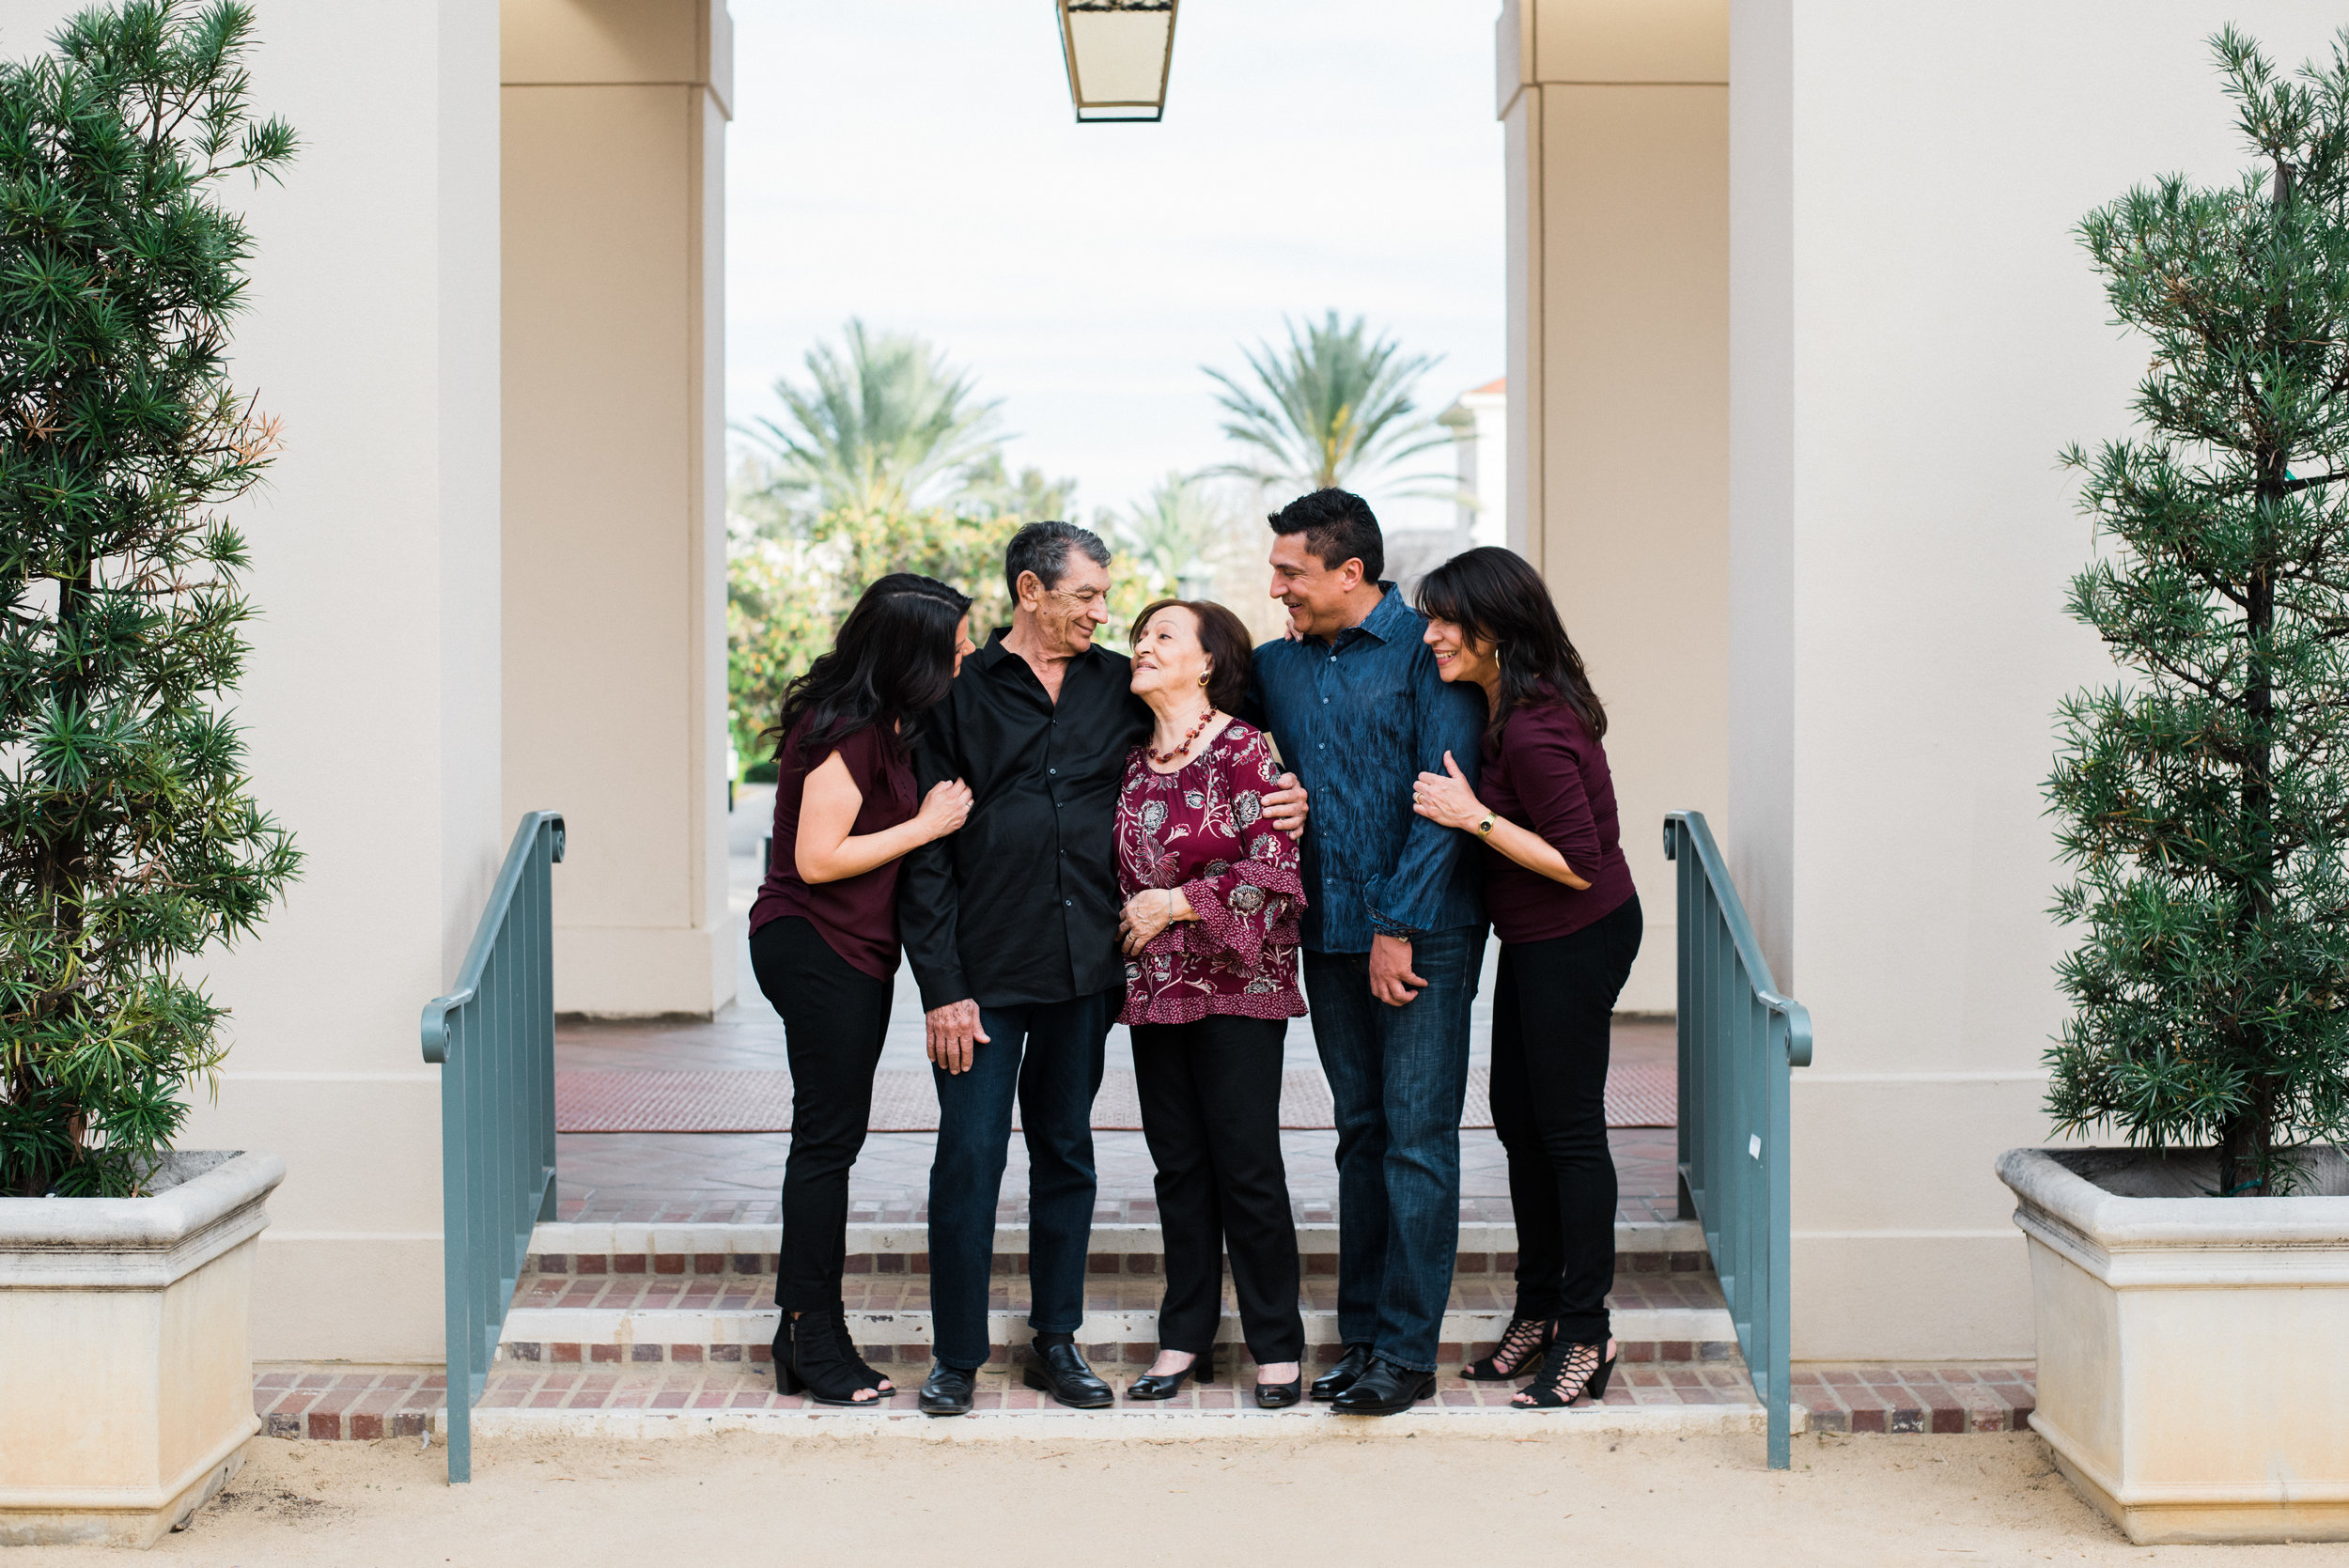 Monica Linda Photography, family photographer in pasadena, ca